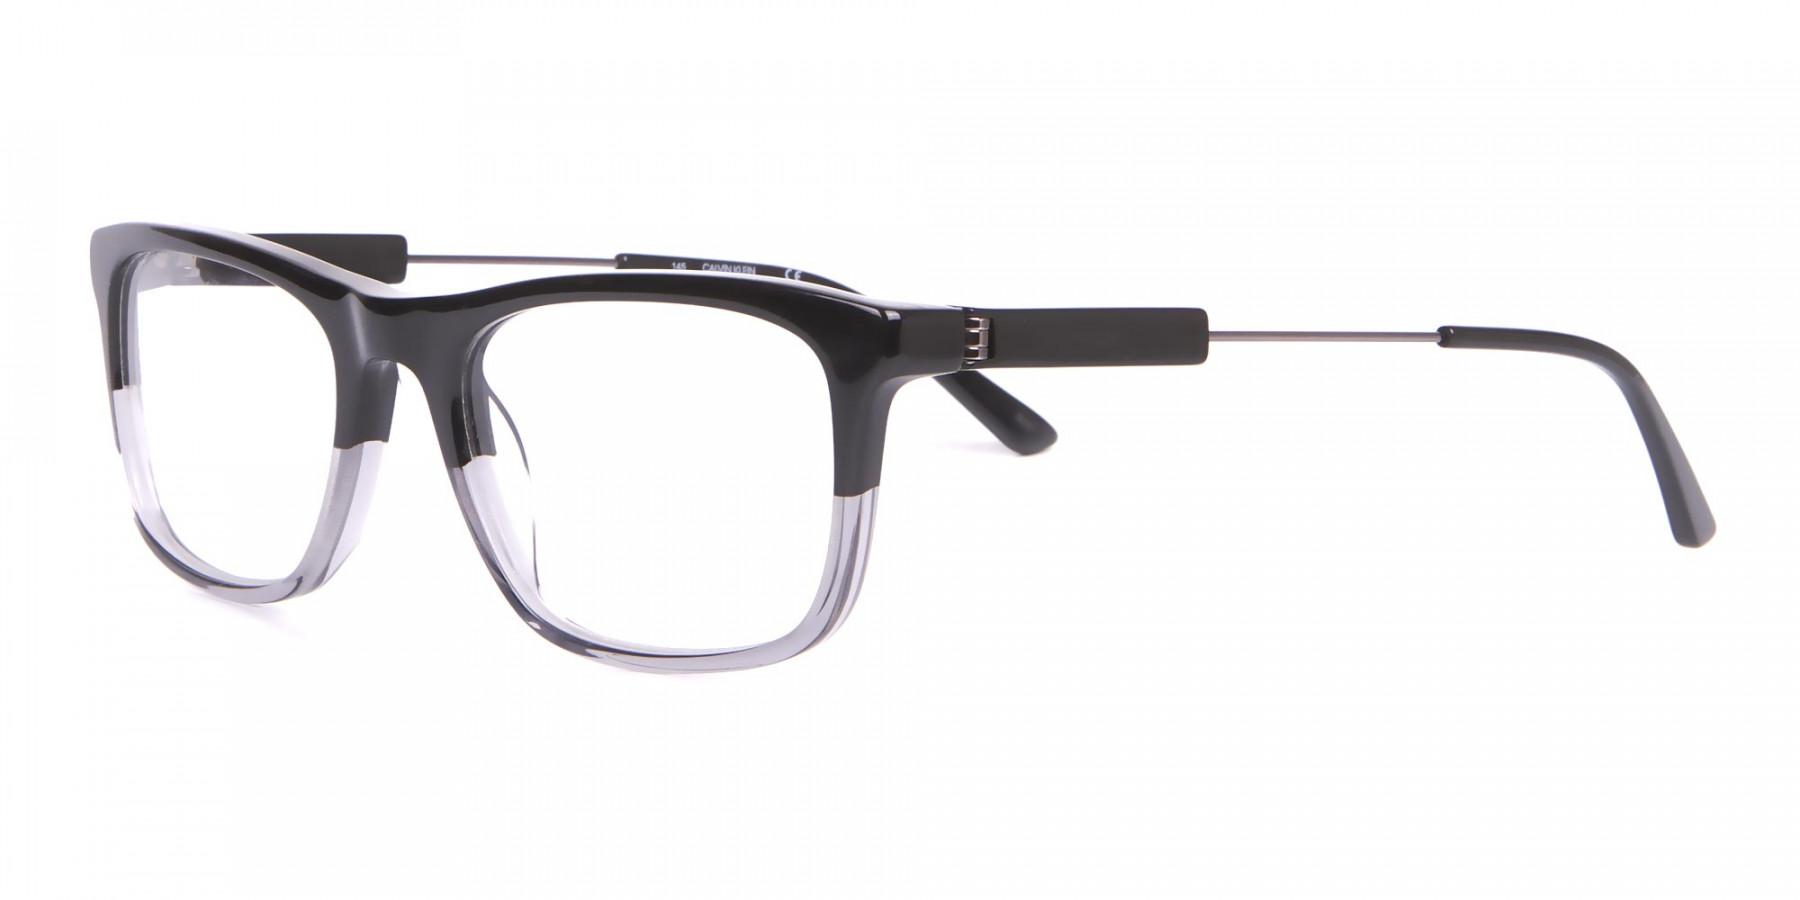 Calvin Klein CK19707 Two-Tone Rectangular Glasses In Black-1